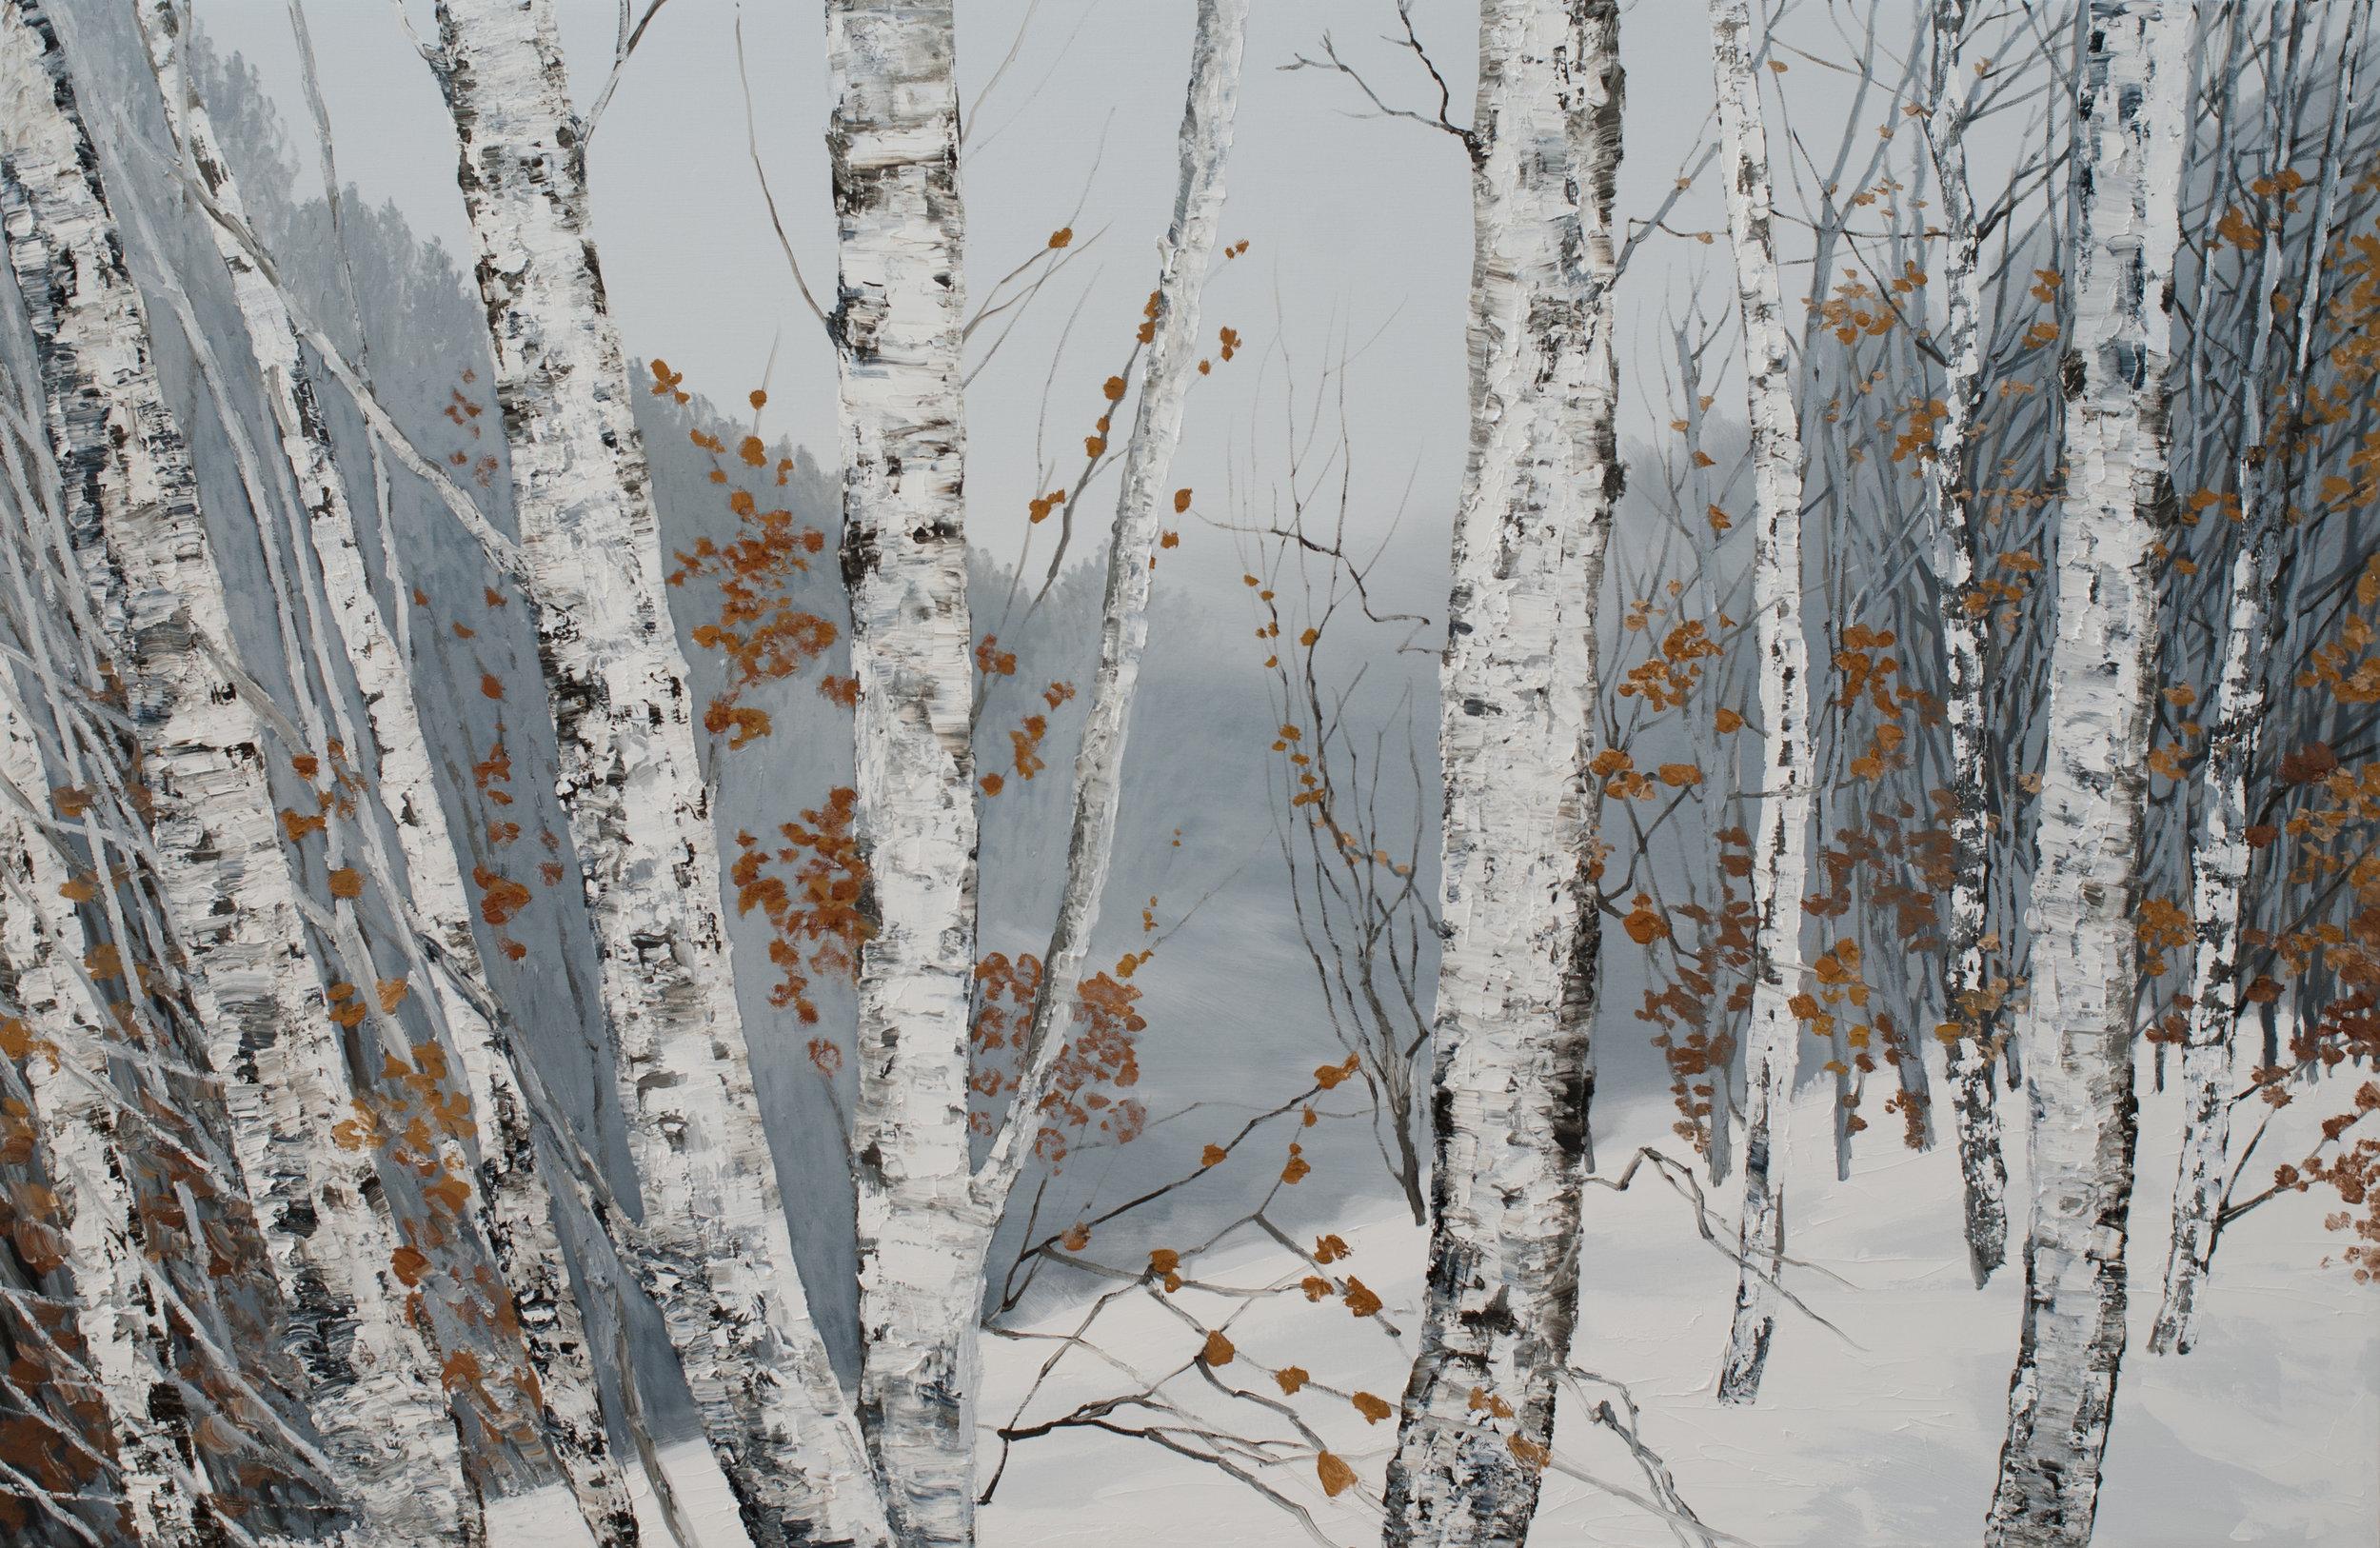 Winterpath (2015)  Hilary Dymond  Courtoisie galerie Claire Gastaud